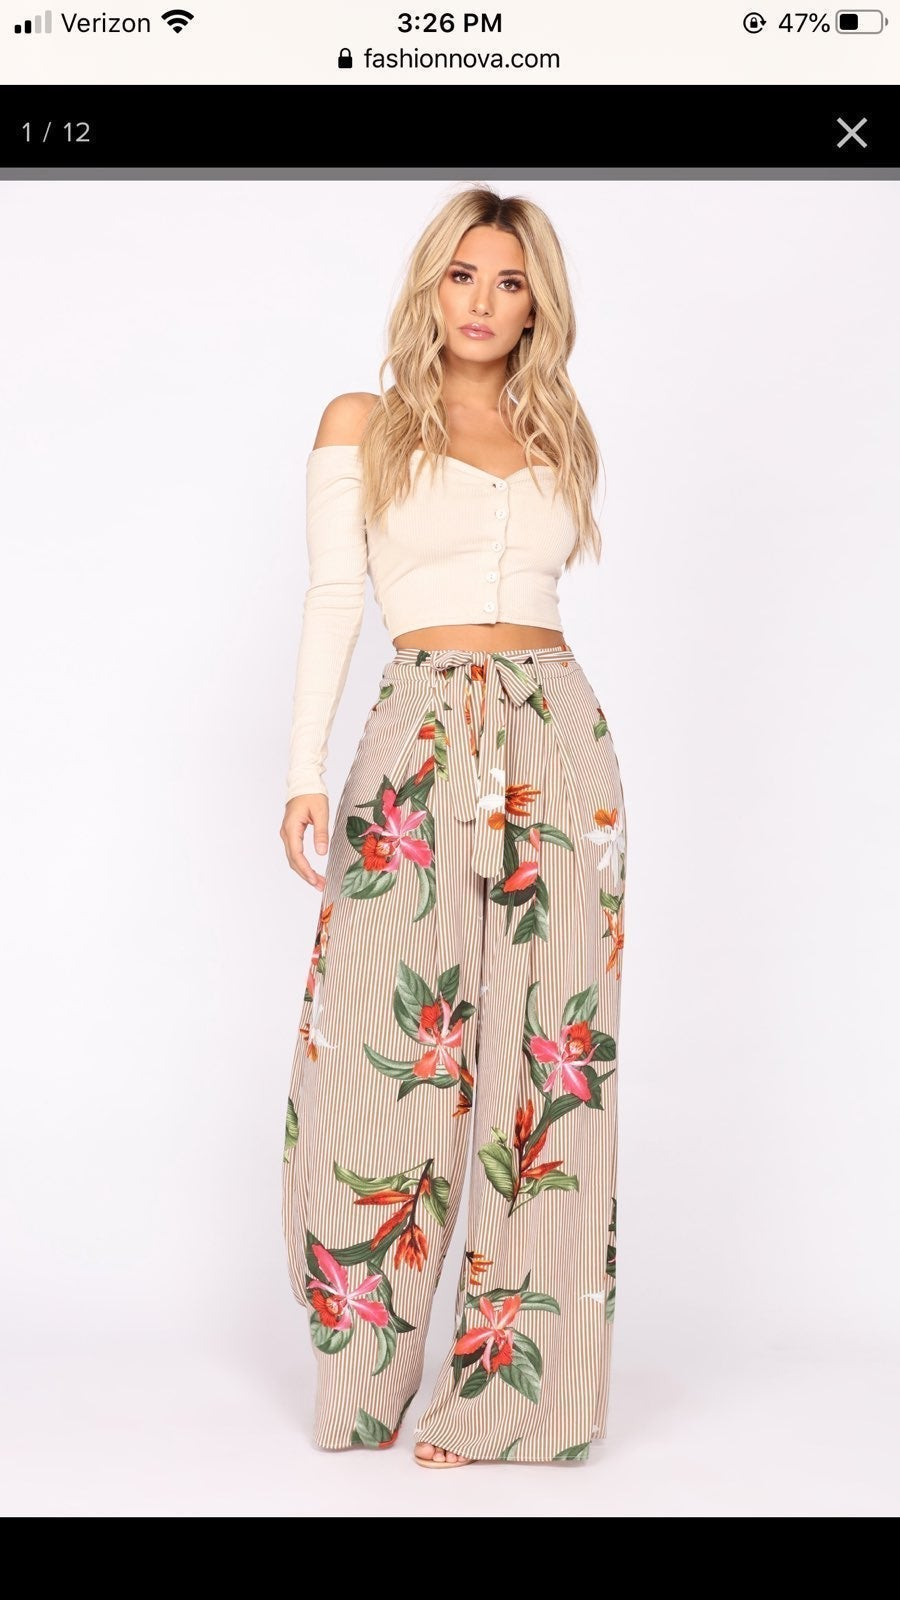 Fashion nova Thailand floral woven pants